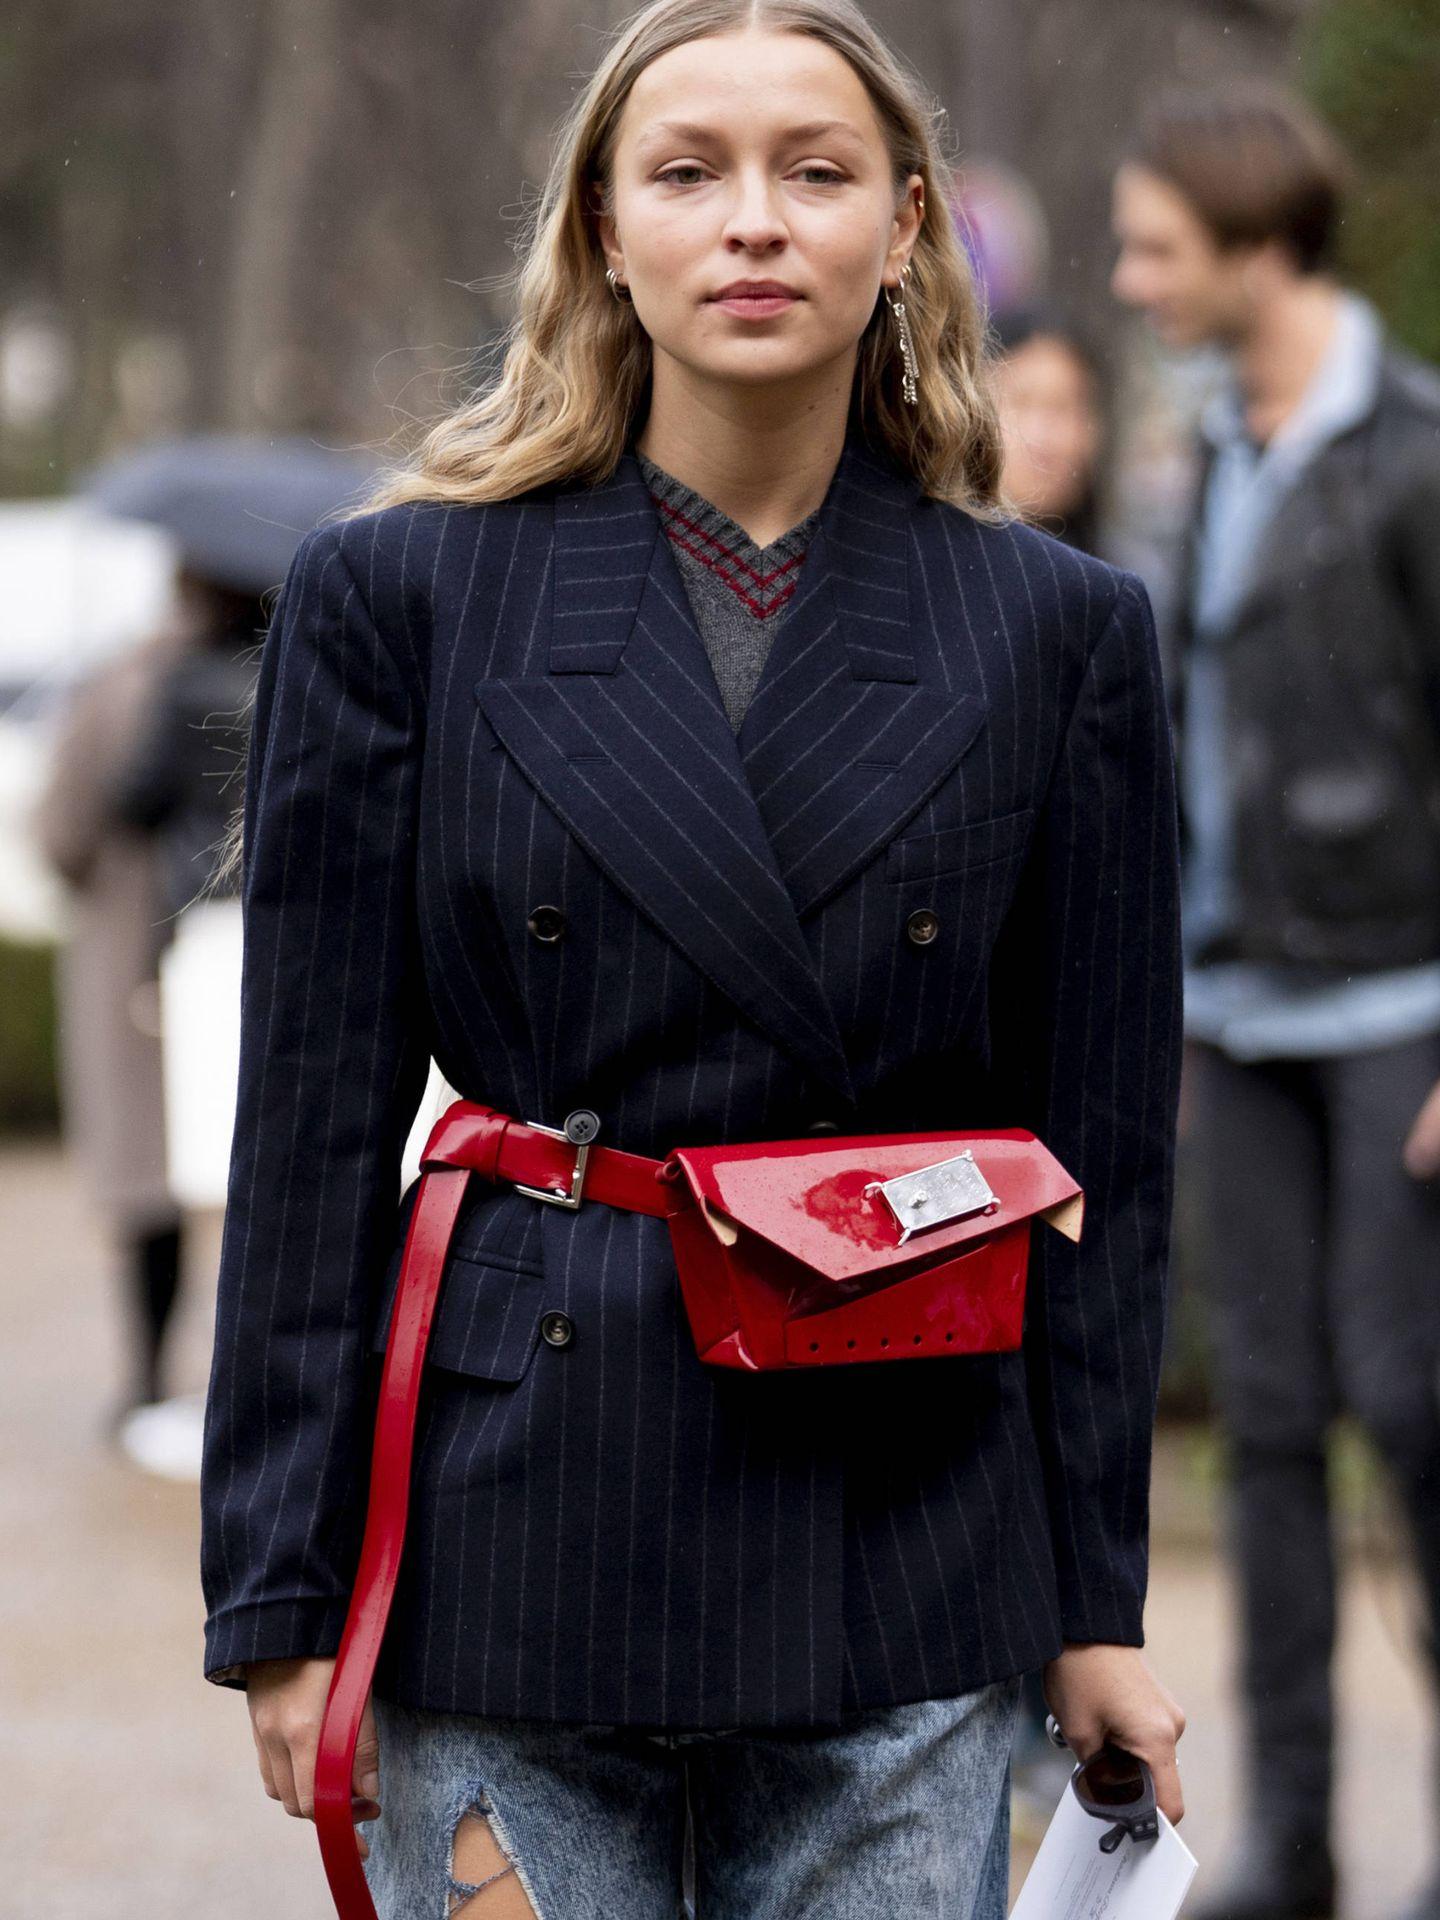 Las americanas oversize siguen siendo un hit total del street style. (Imaxtree)